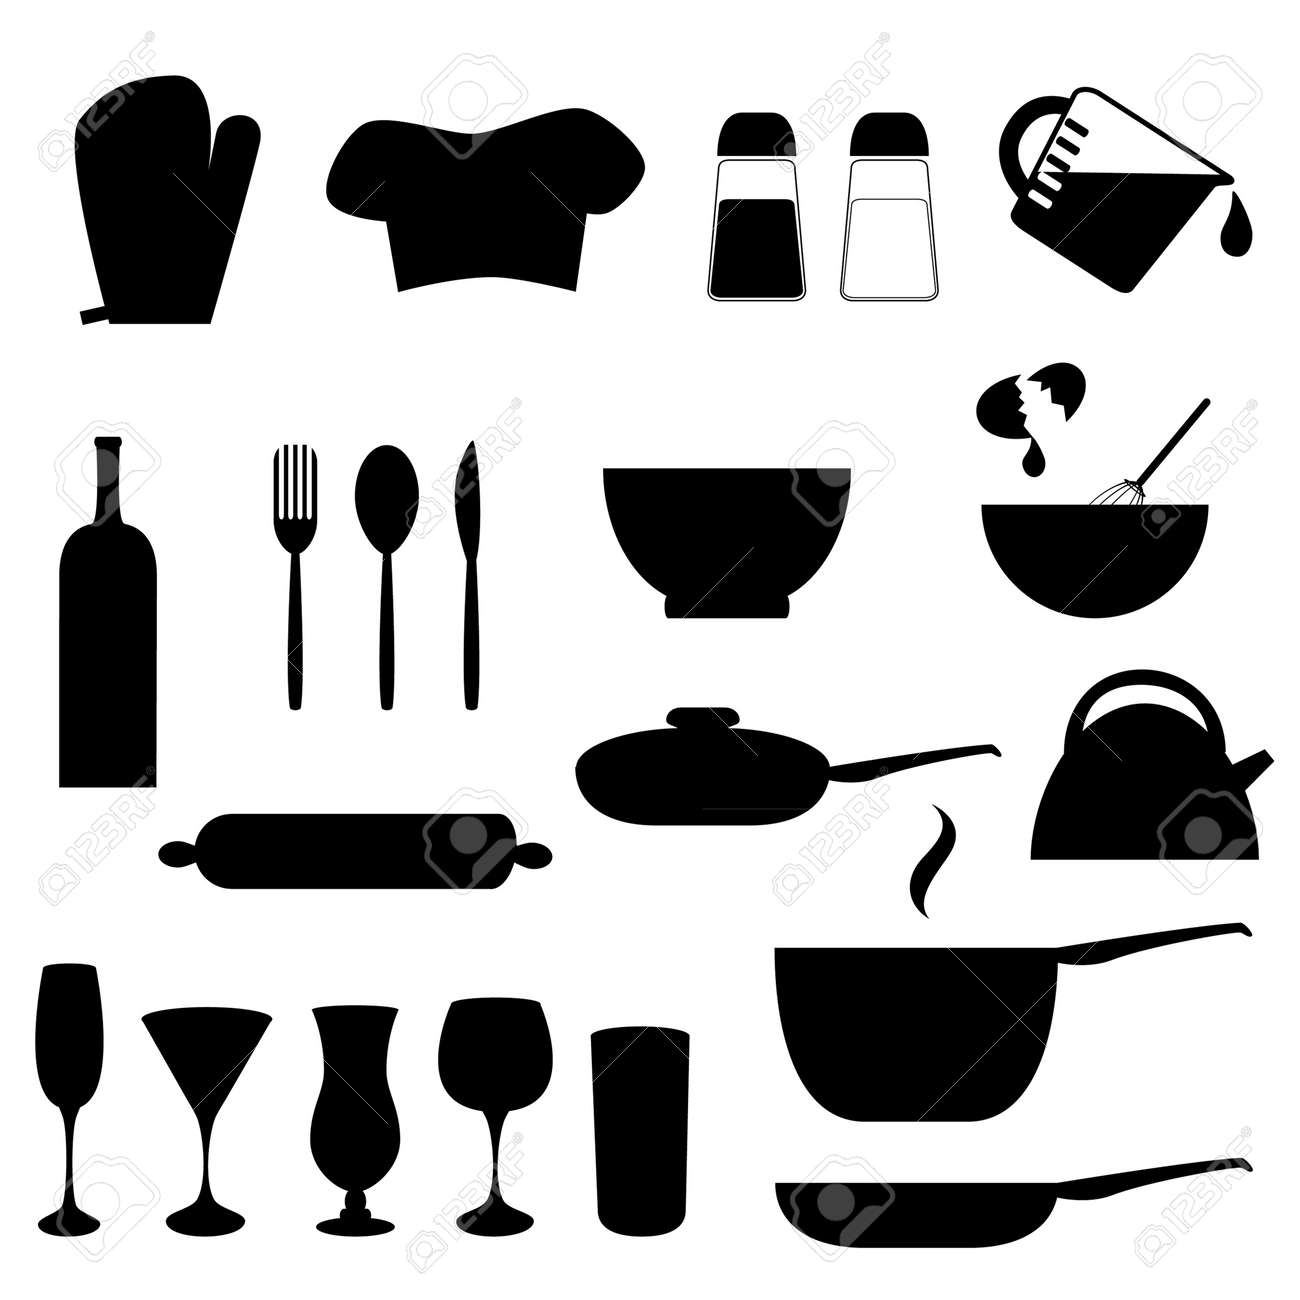 Baking Tools Vector 2510 Baking Tools Stock Illustrations Cliparts And Royalty Free